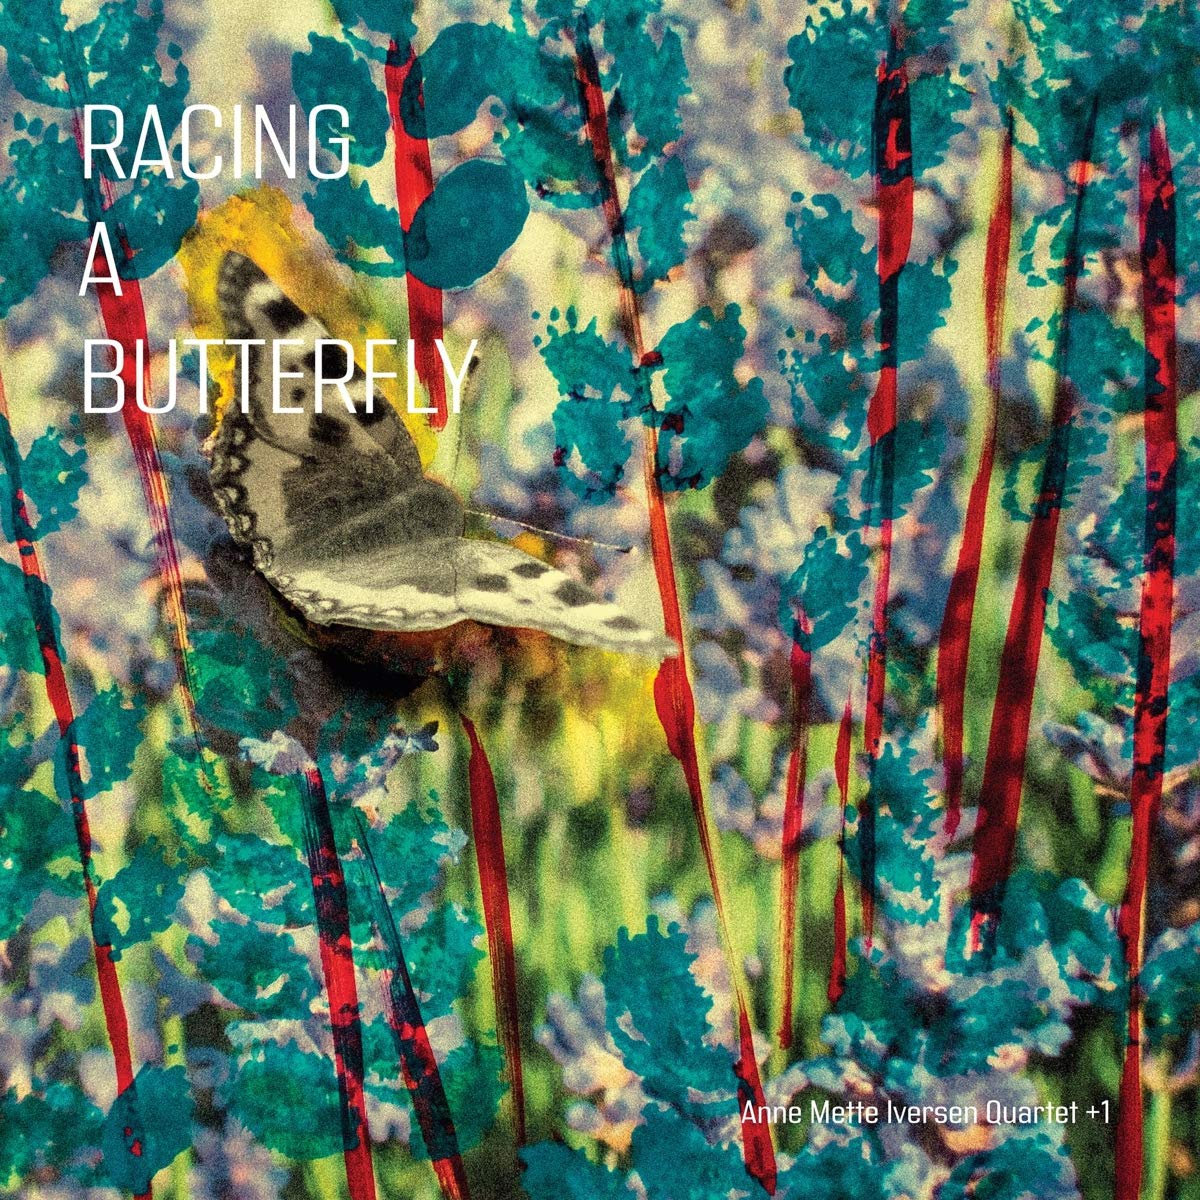 ANNE METTE IVERSEN - Anne Mette Iversen Quartet+1 : Racing a Butterfly cover